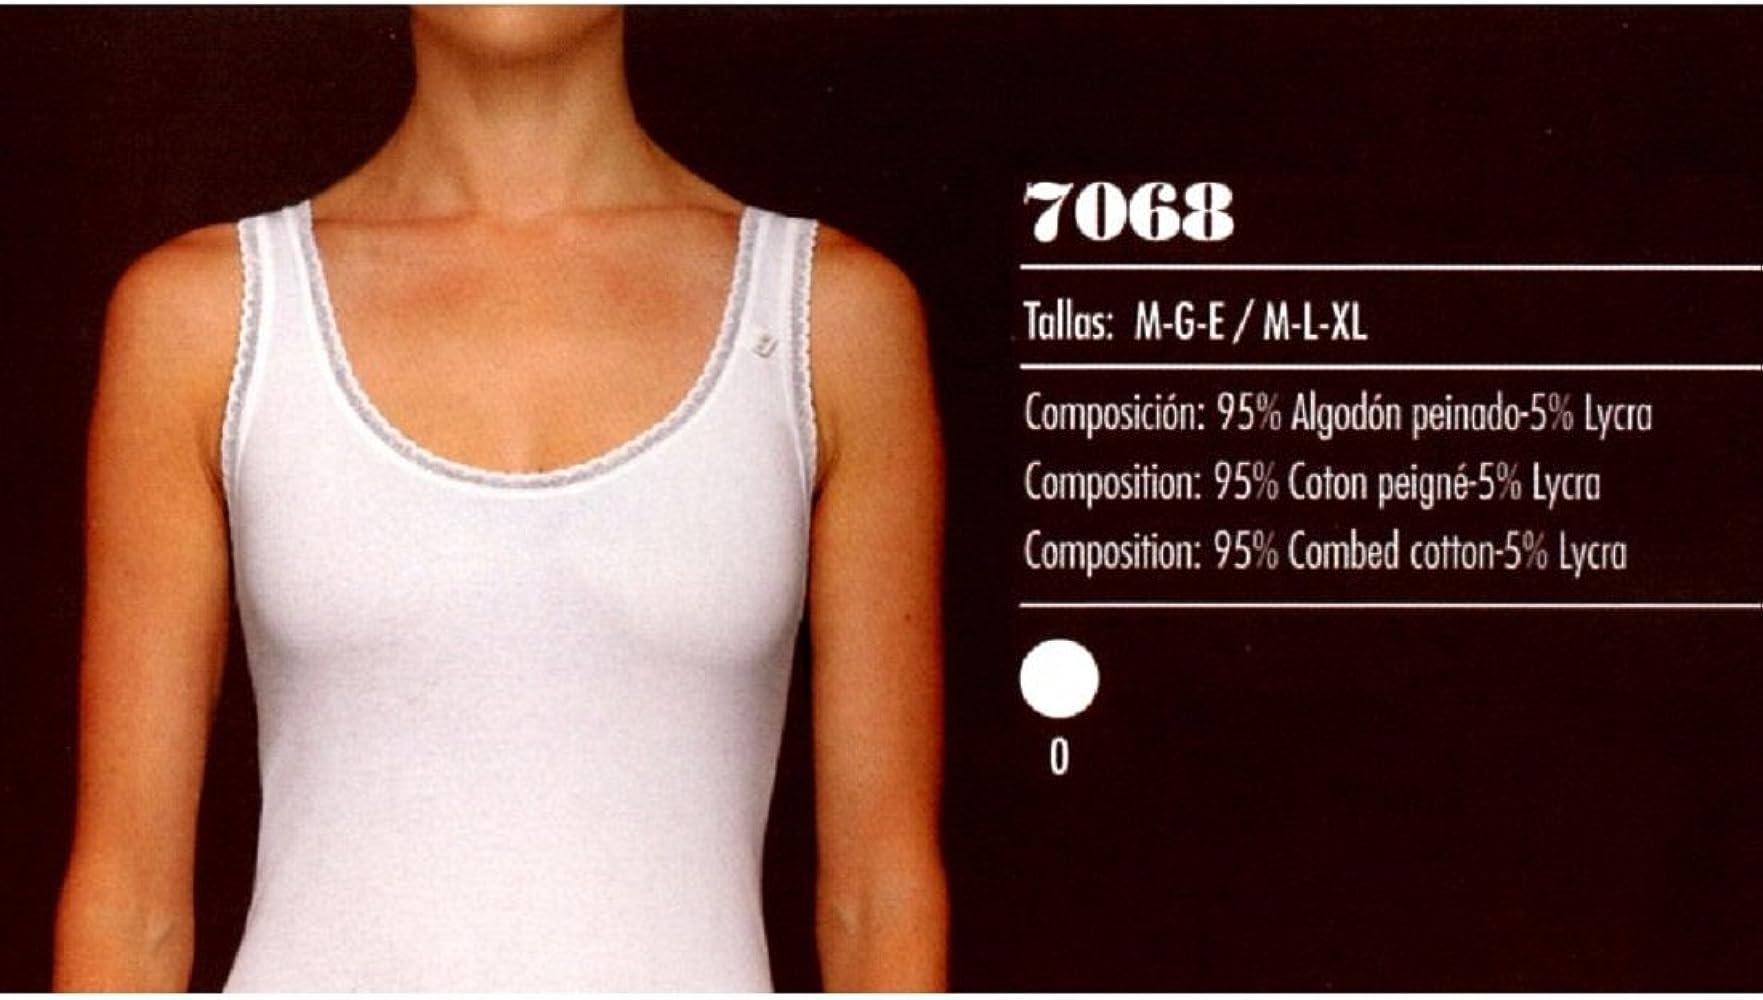 AVET 7068 - Camiseta Interior Tirante Ancho (E): Amazon.es: Ropa y accesorios